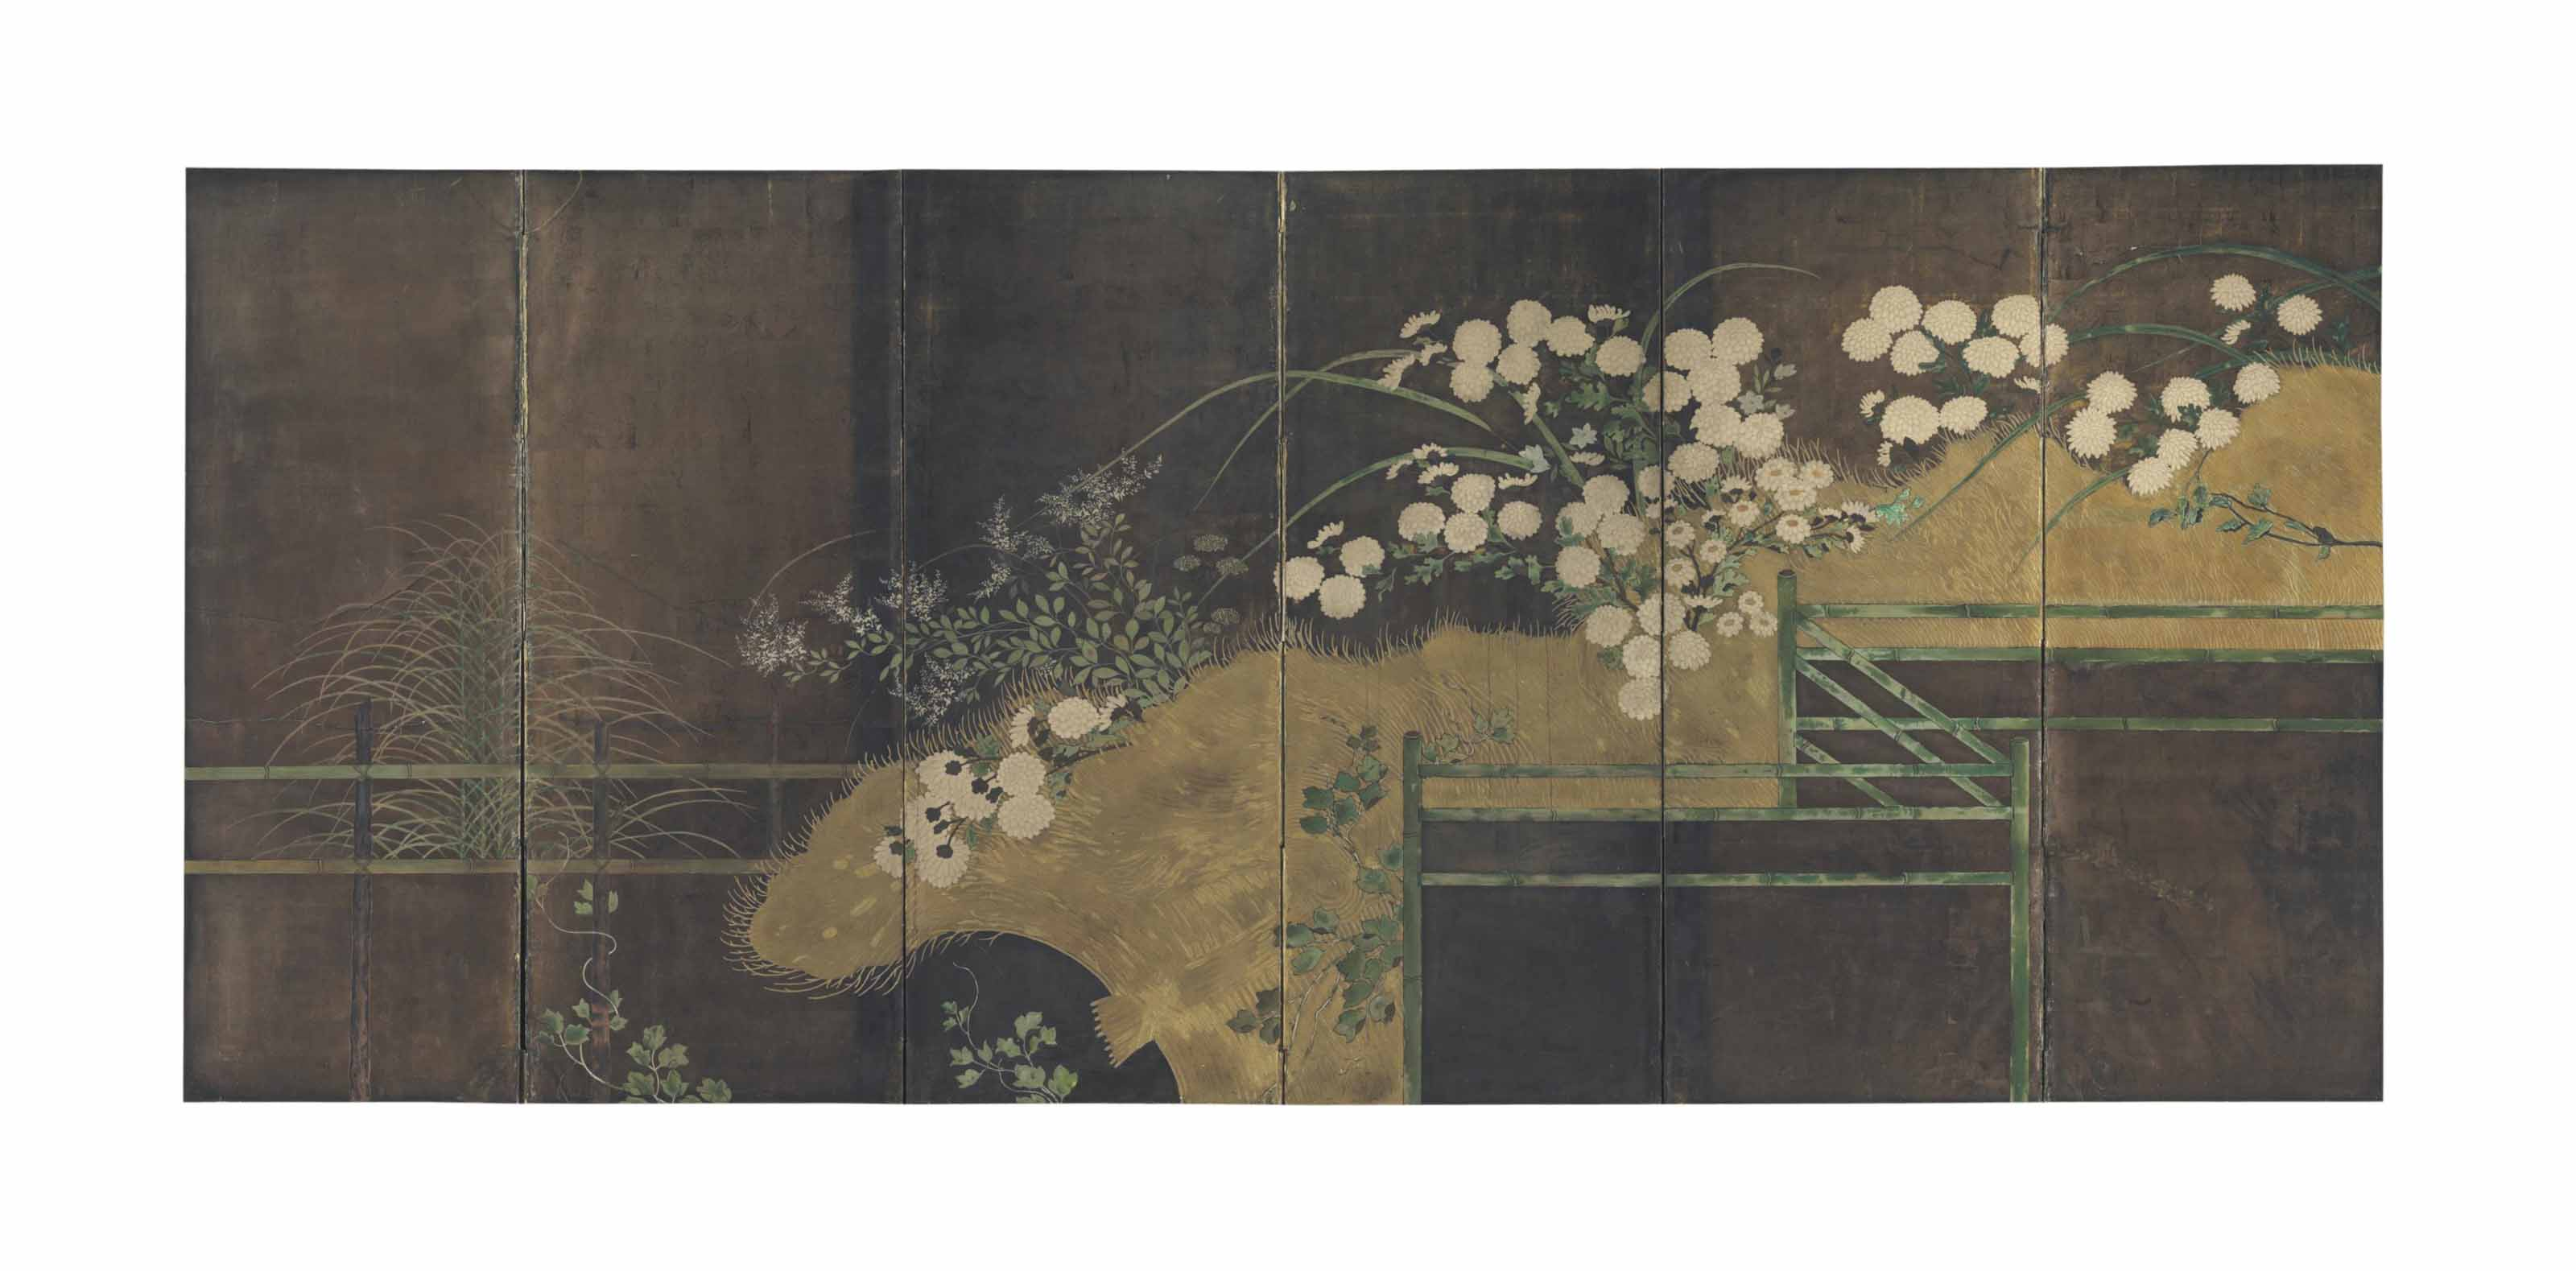 A JAPANESE SIX-PANEL FLOOR SCR